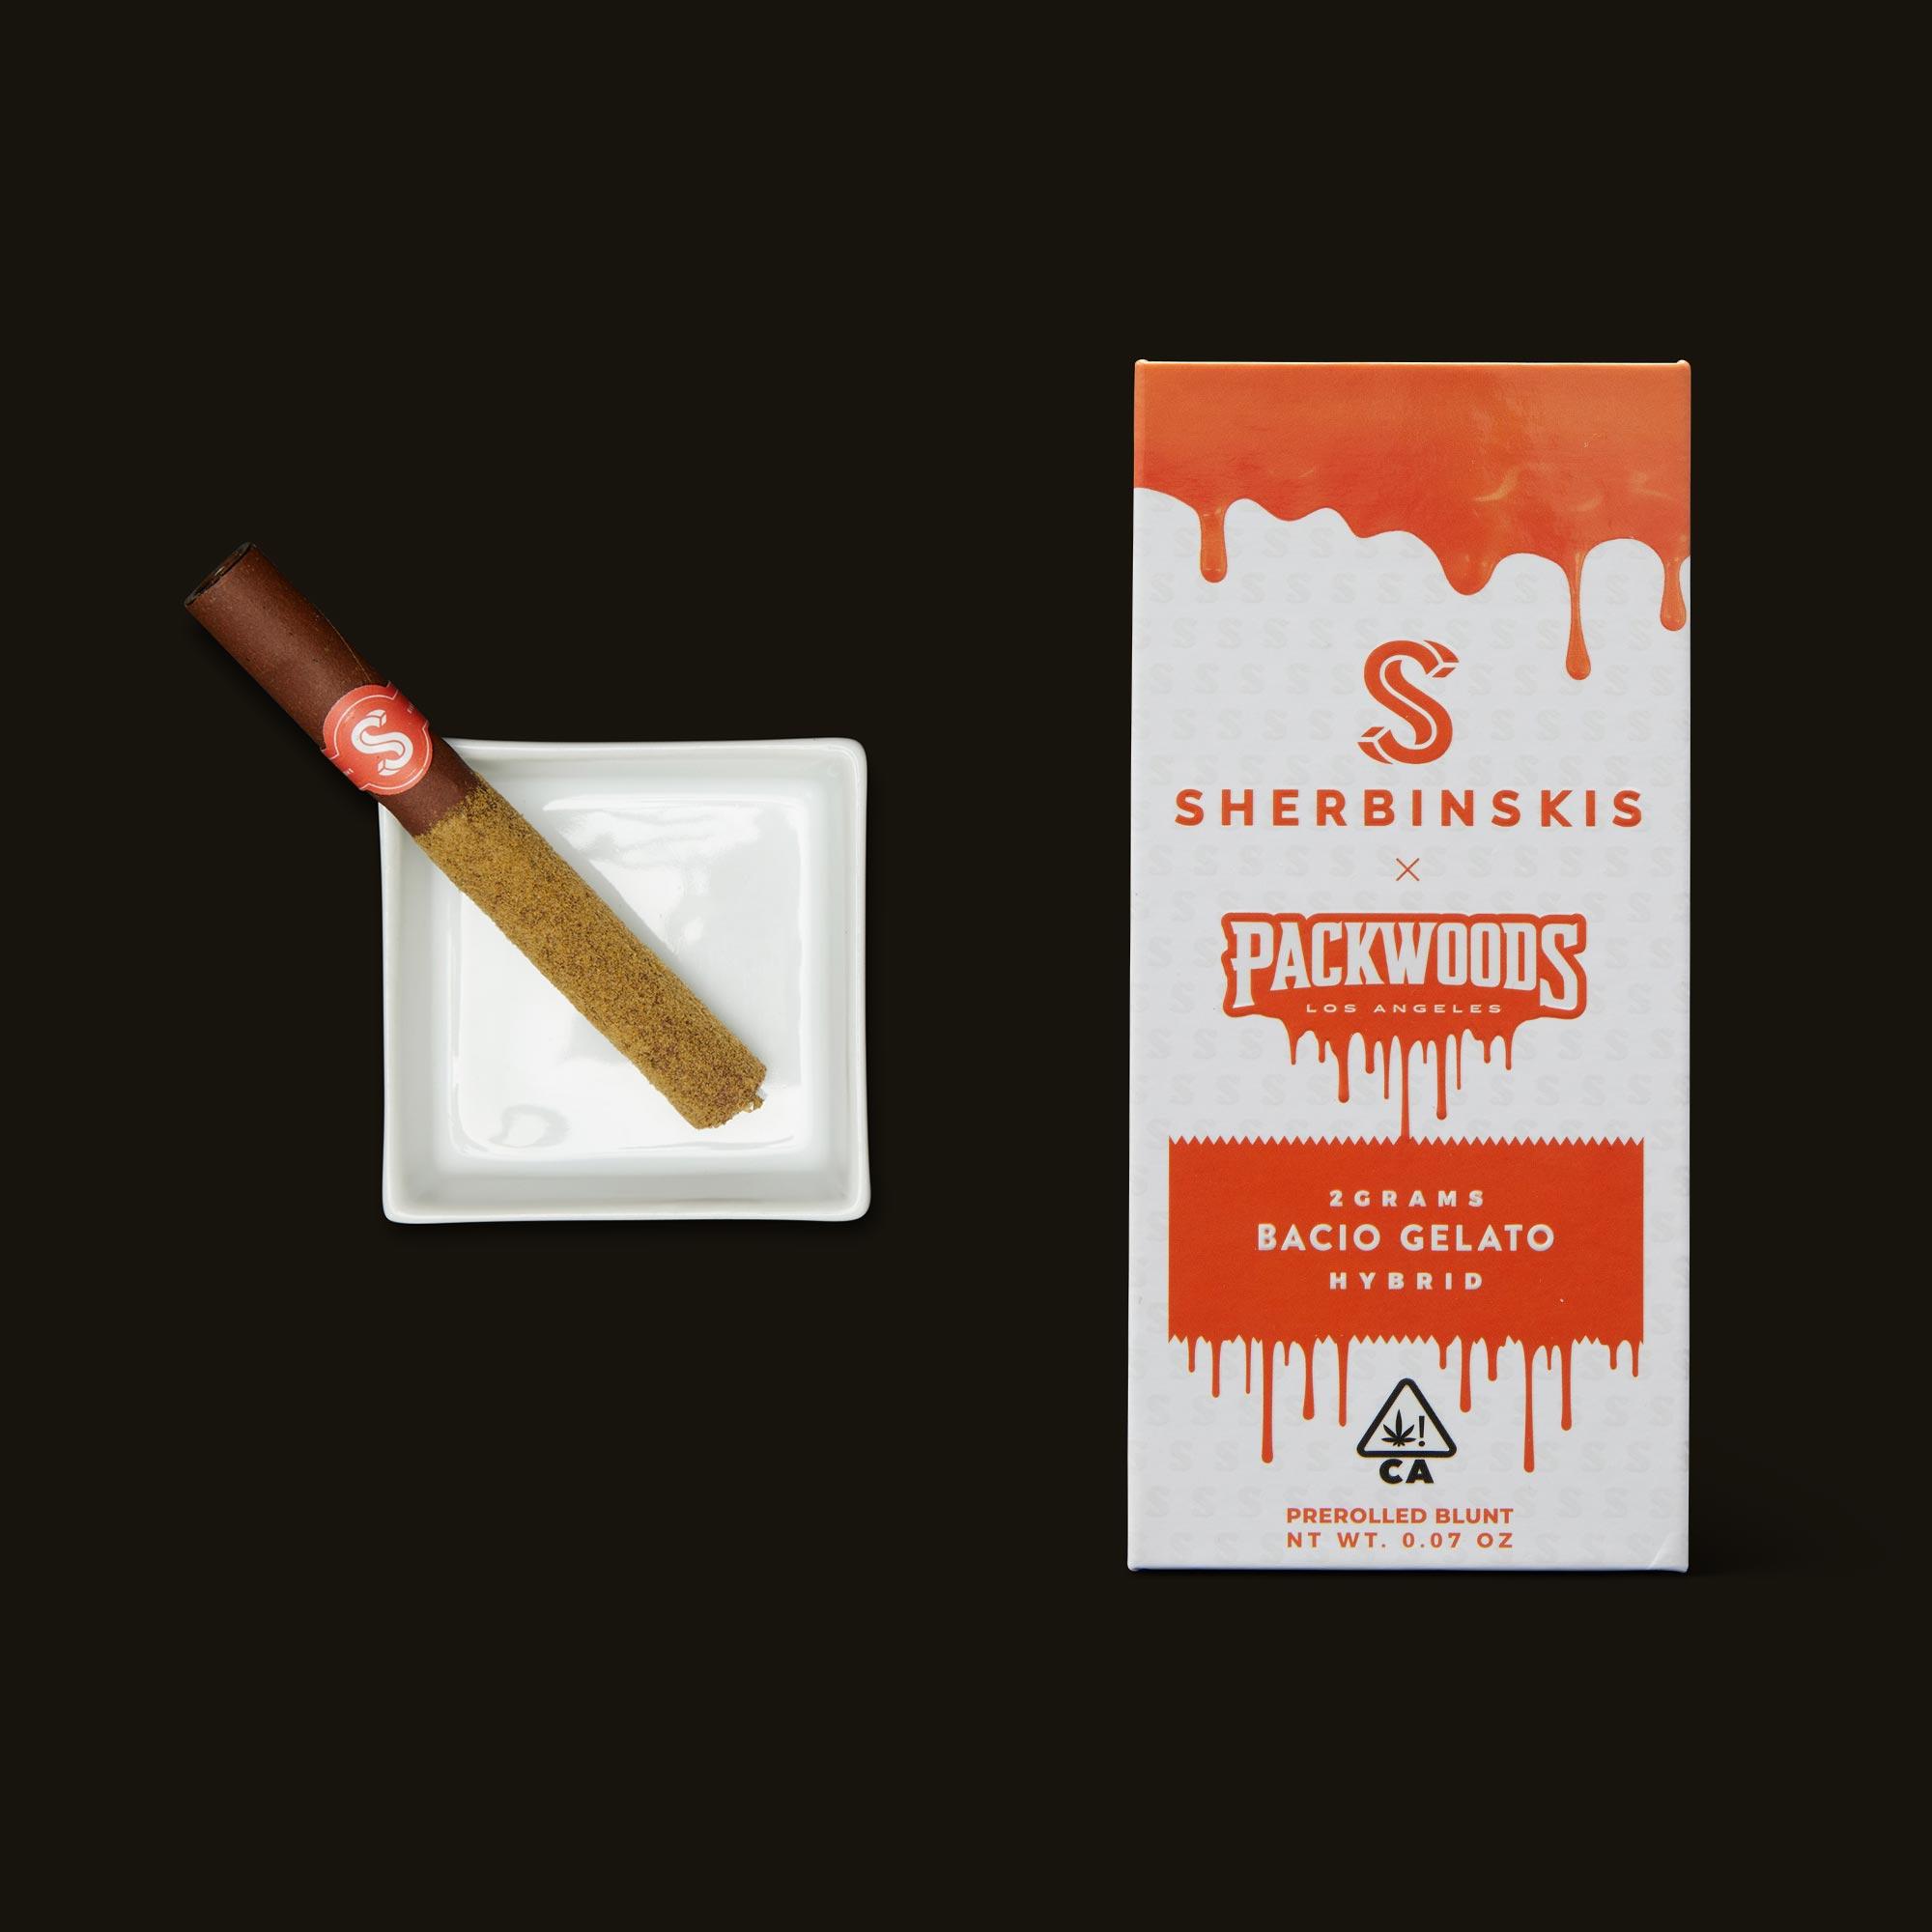 Packwoods Sherbinskis x Packwoods Bacio Gelato Blunt